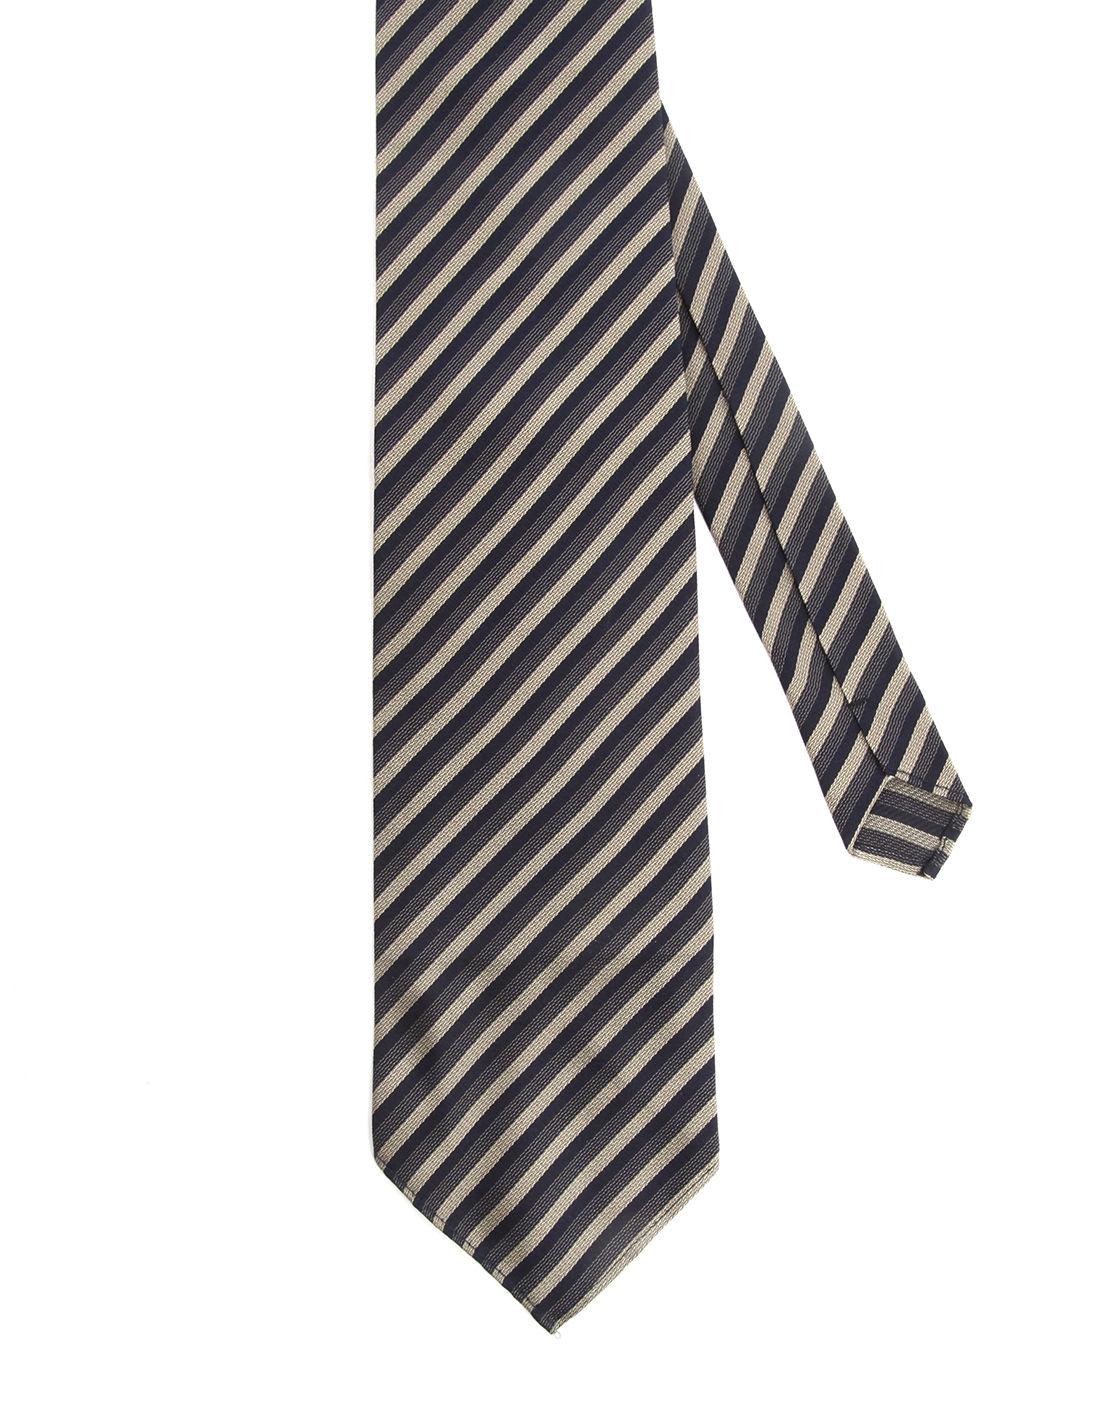 Atelier scotch striped silk tie in gold for men lyst for Atelier maison scotch